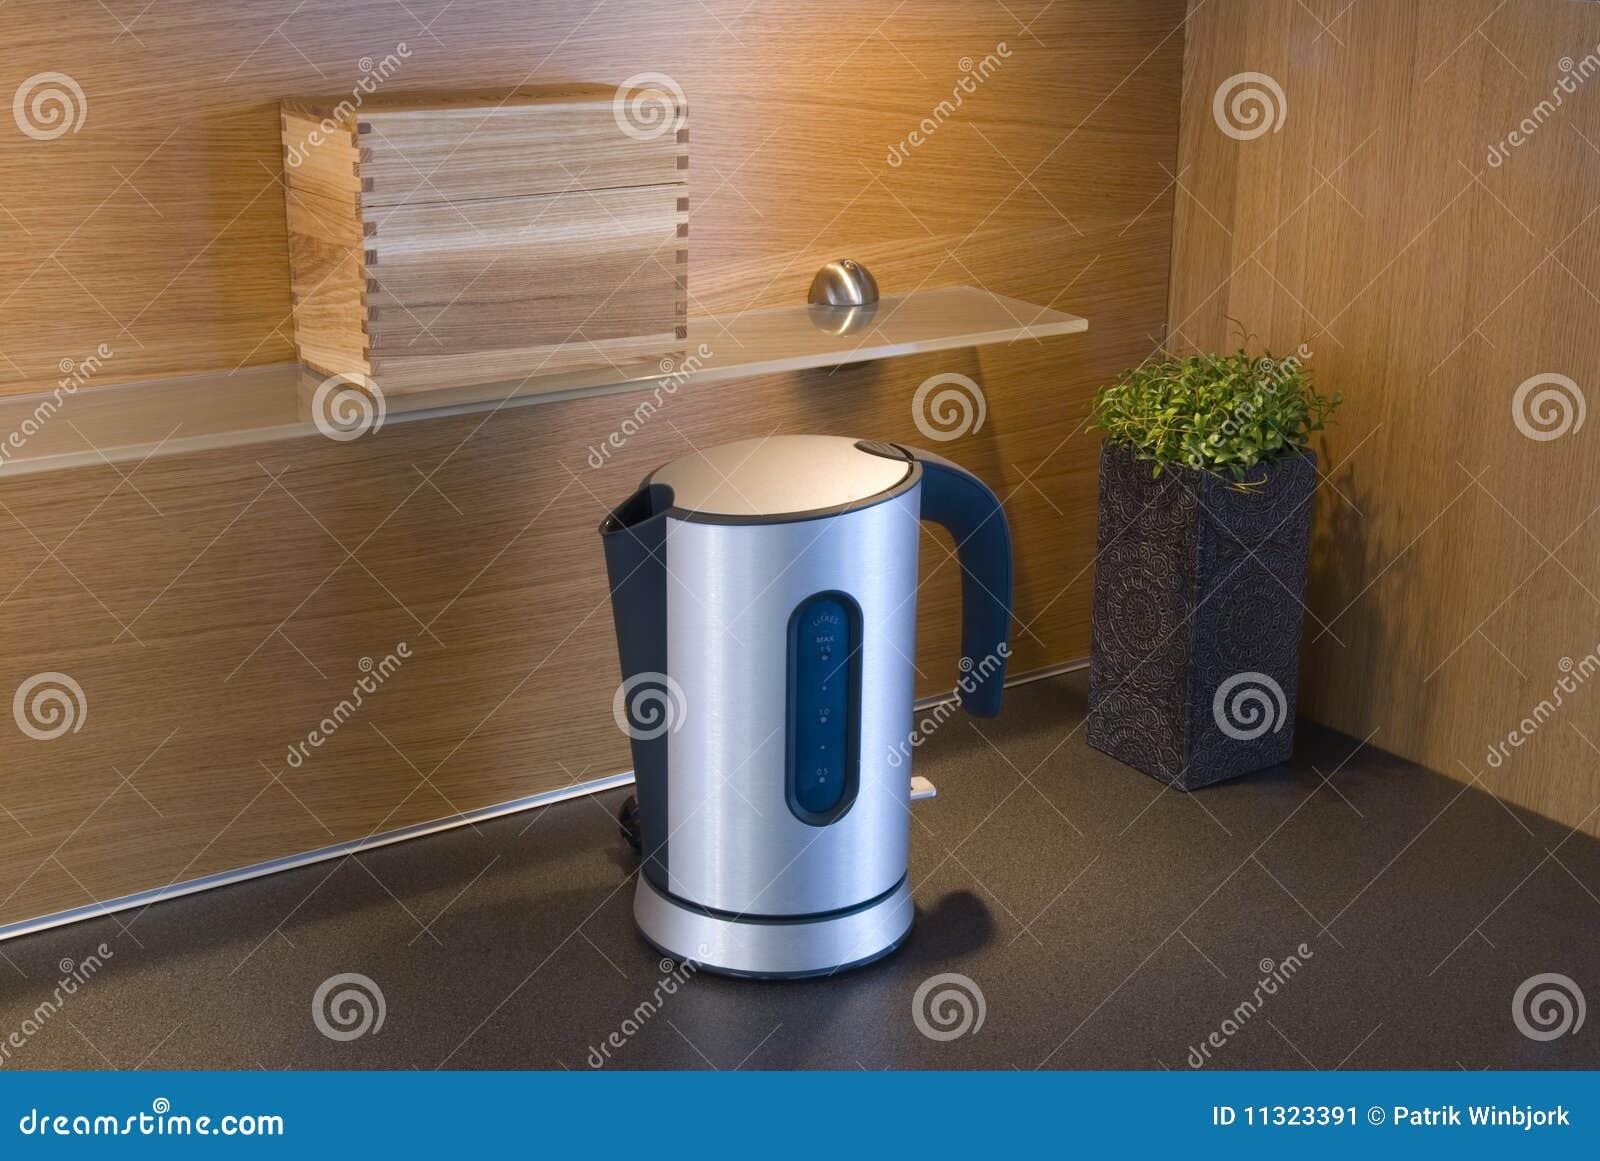 Ein waterboiler